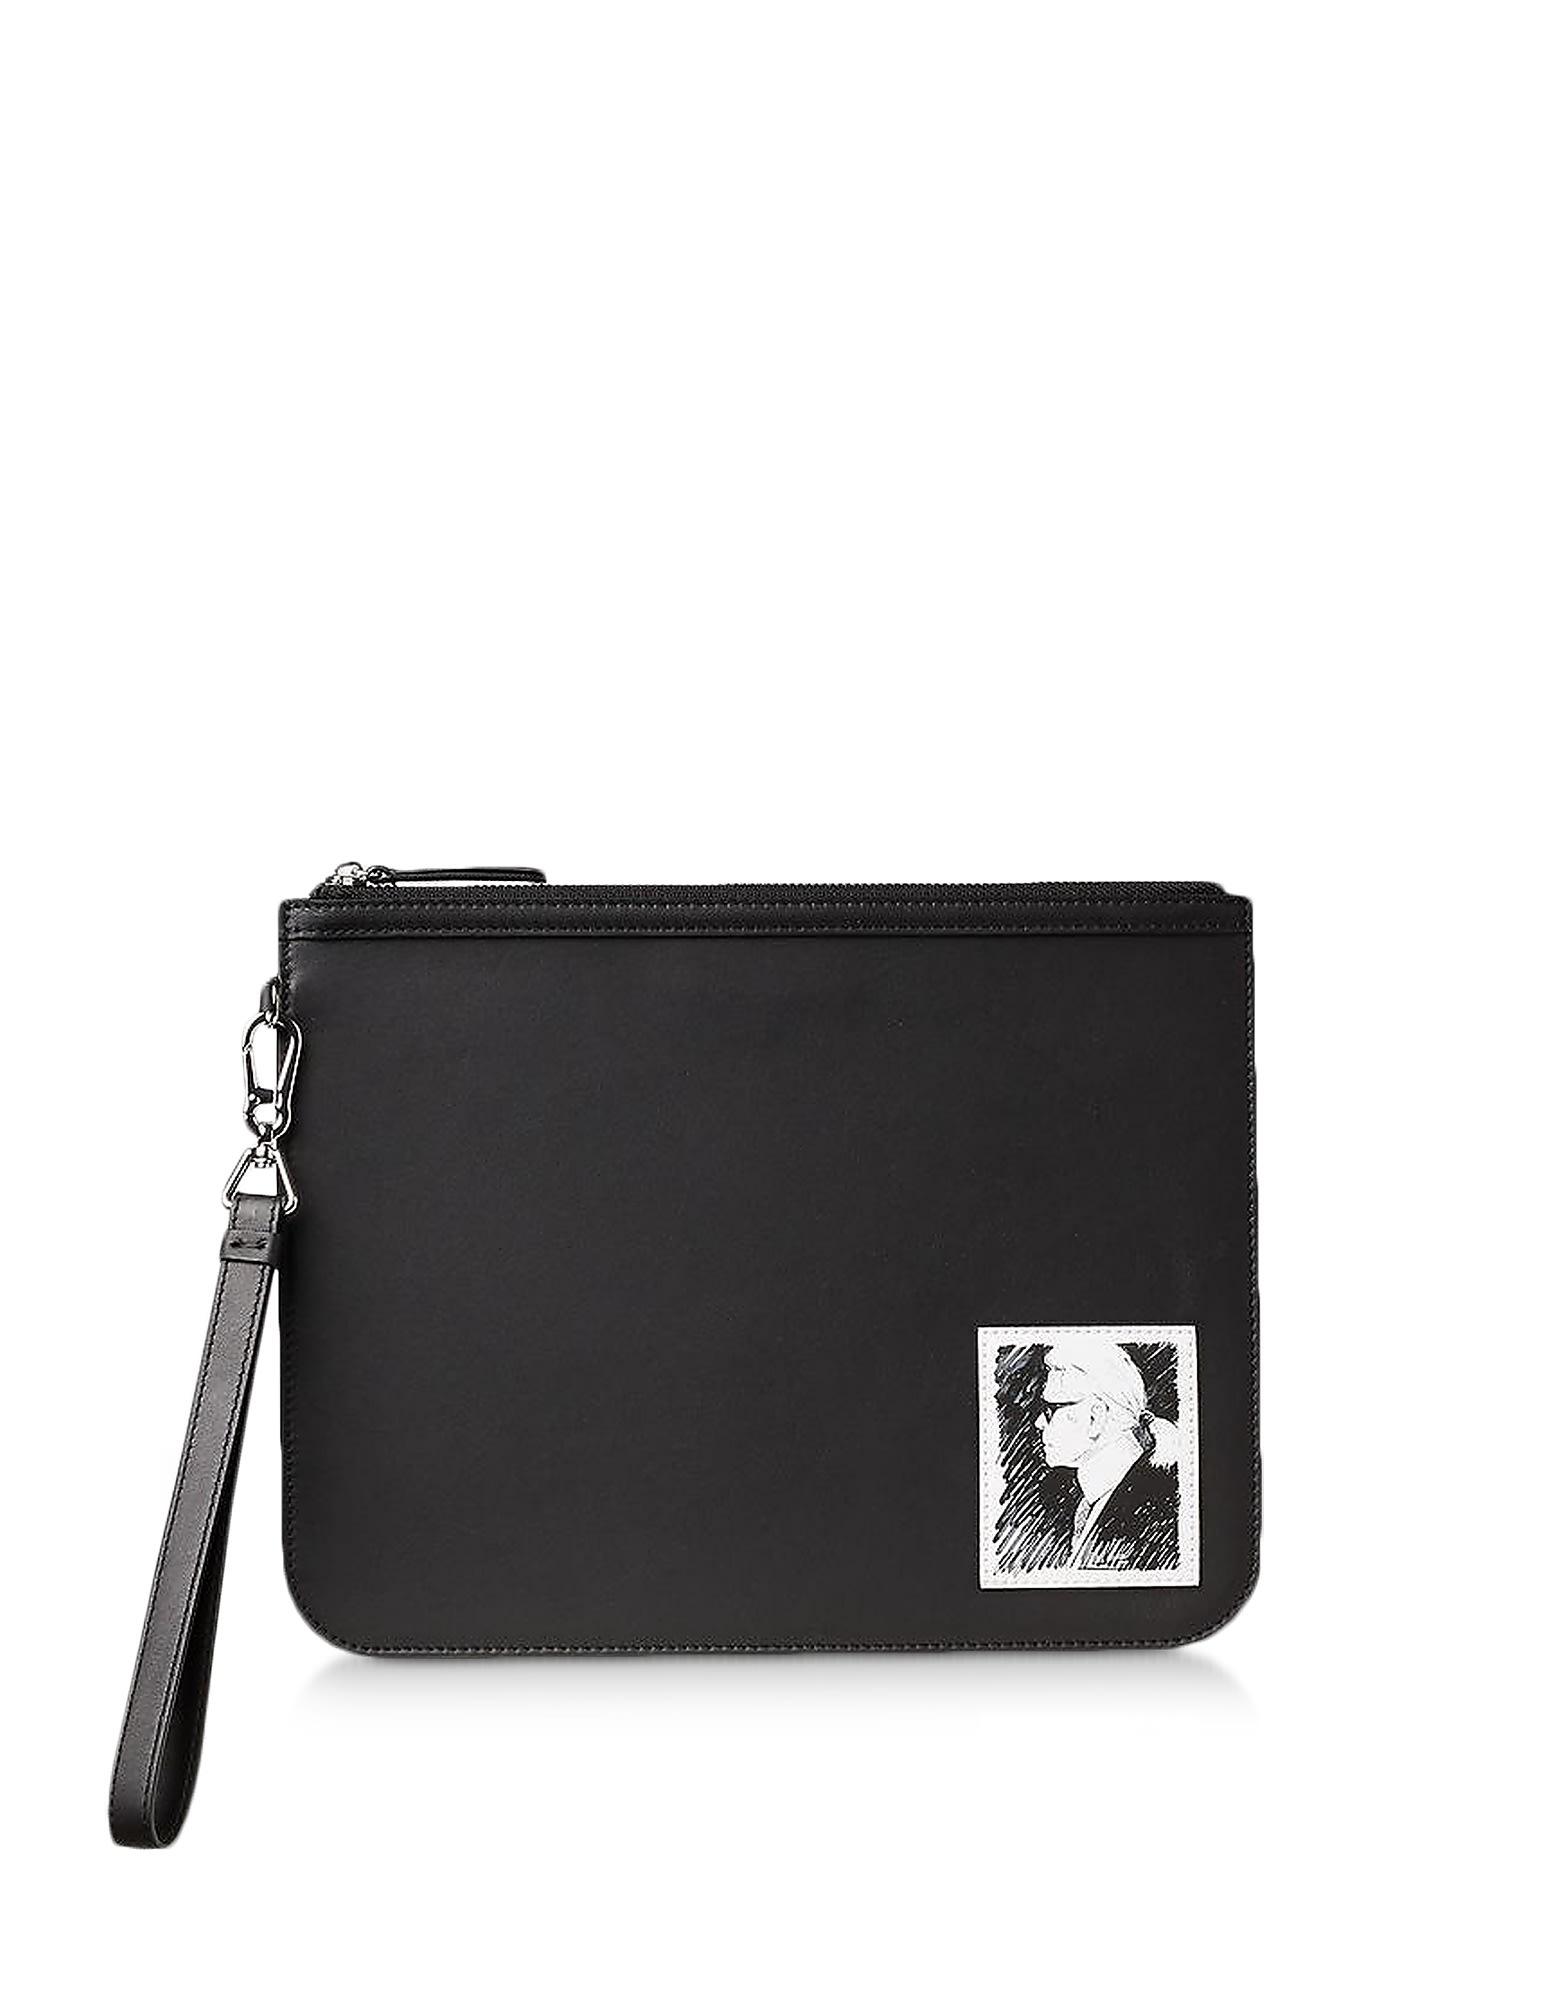 Karl Lagerfeld Clutch KARL LEGEND LUXURY CLUTCH